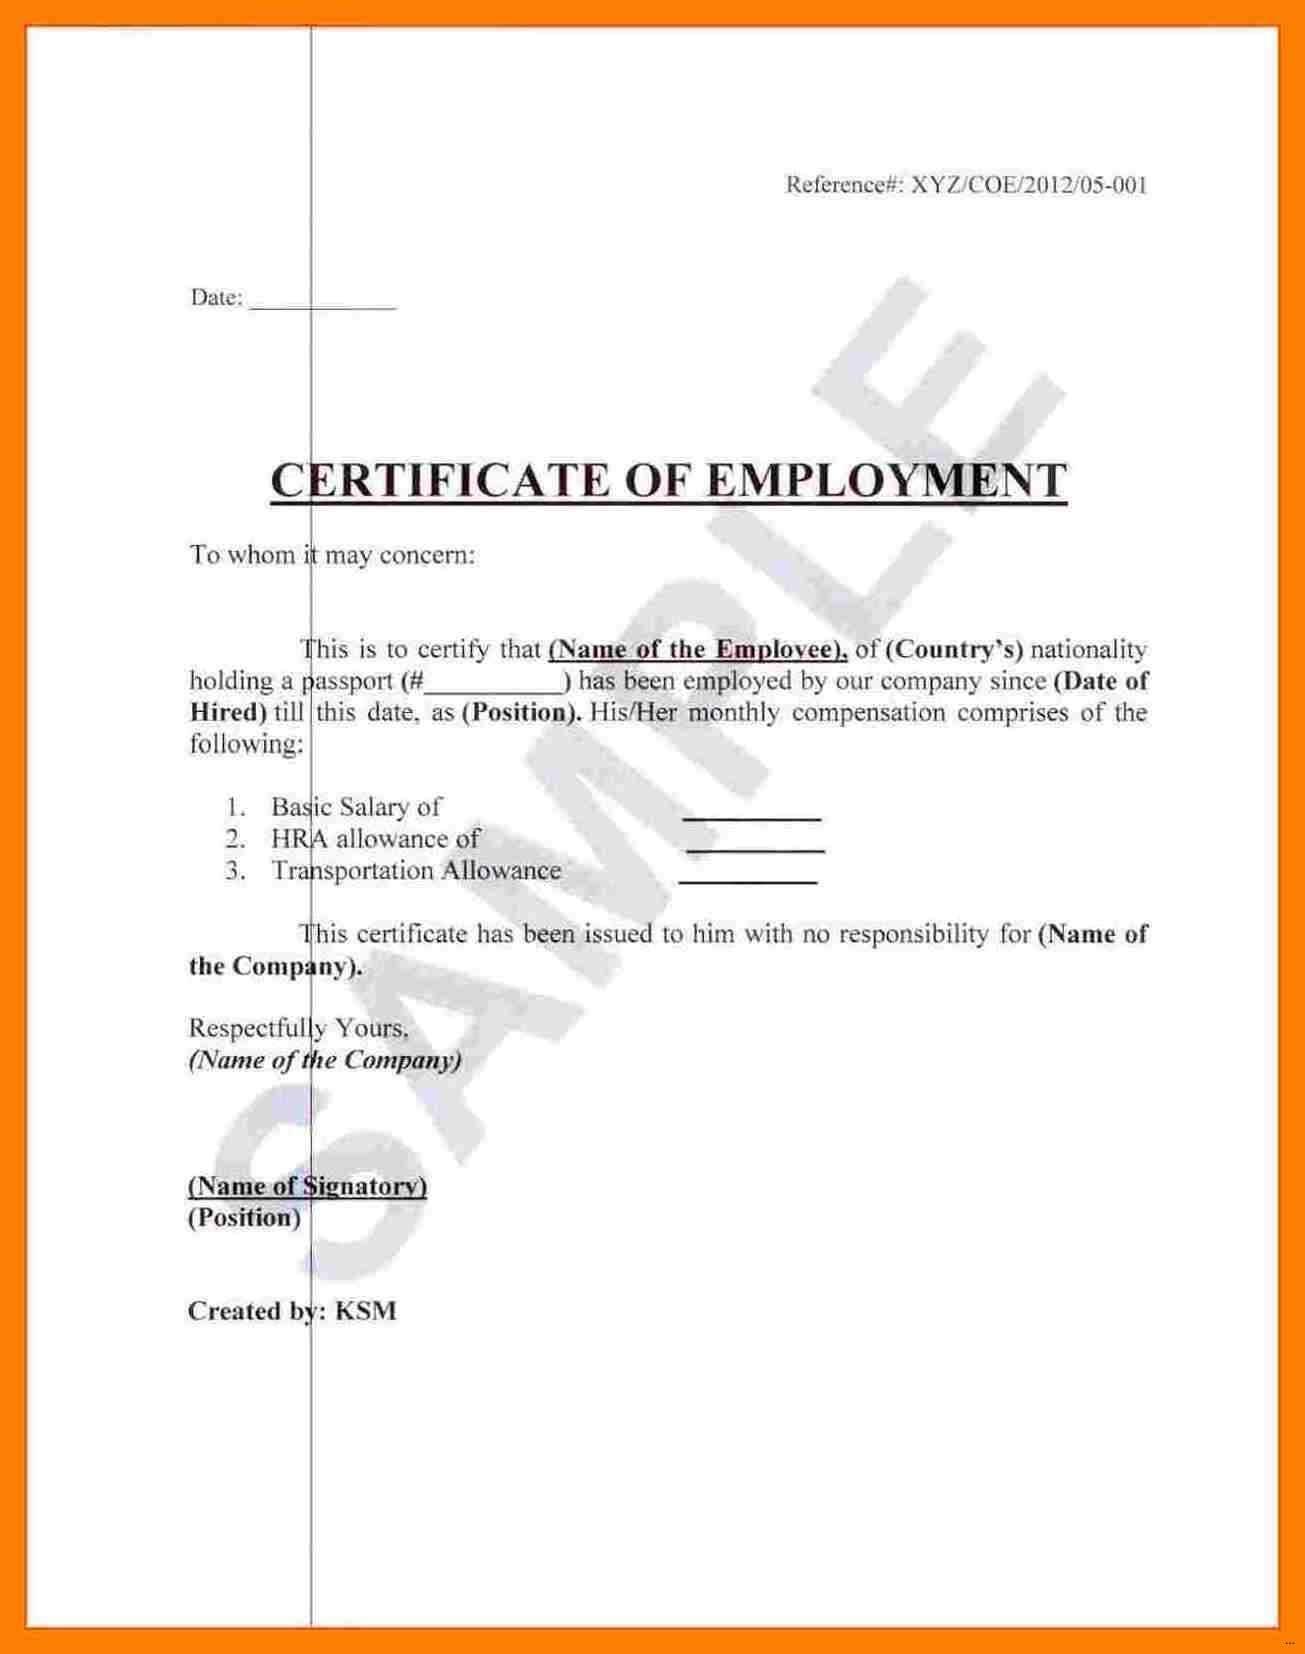 Employment Certificate Template - Zohre.horizonconsulting.co In Certificate Of Employment Template